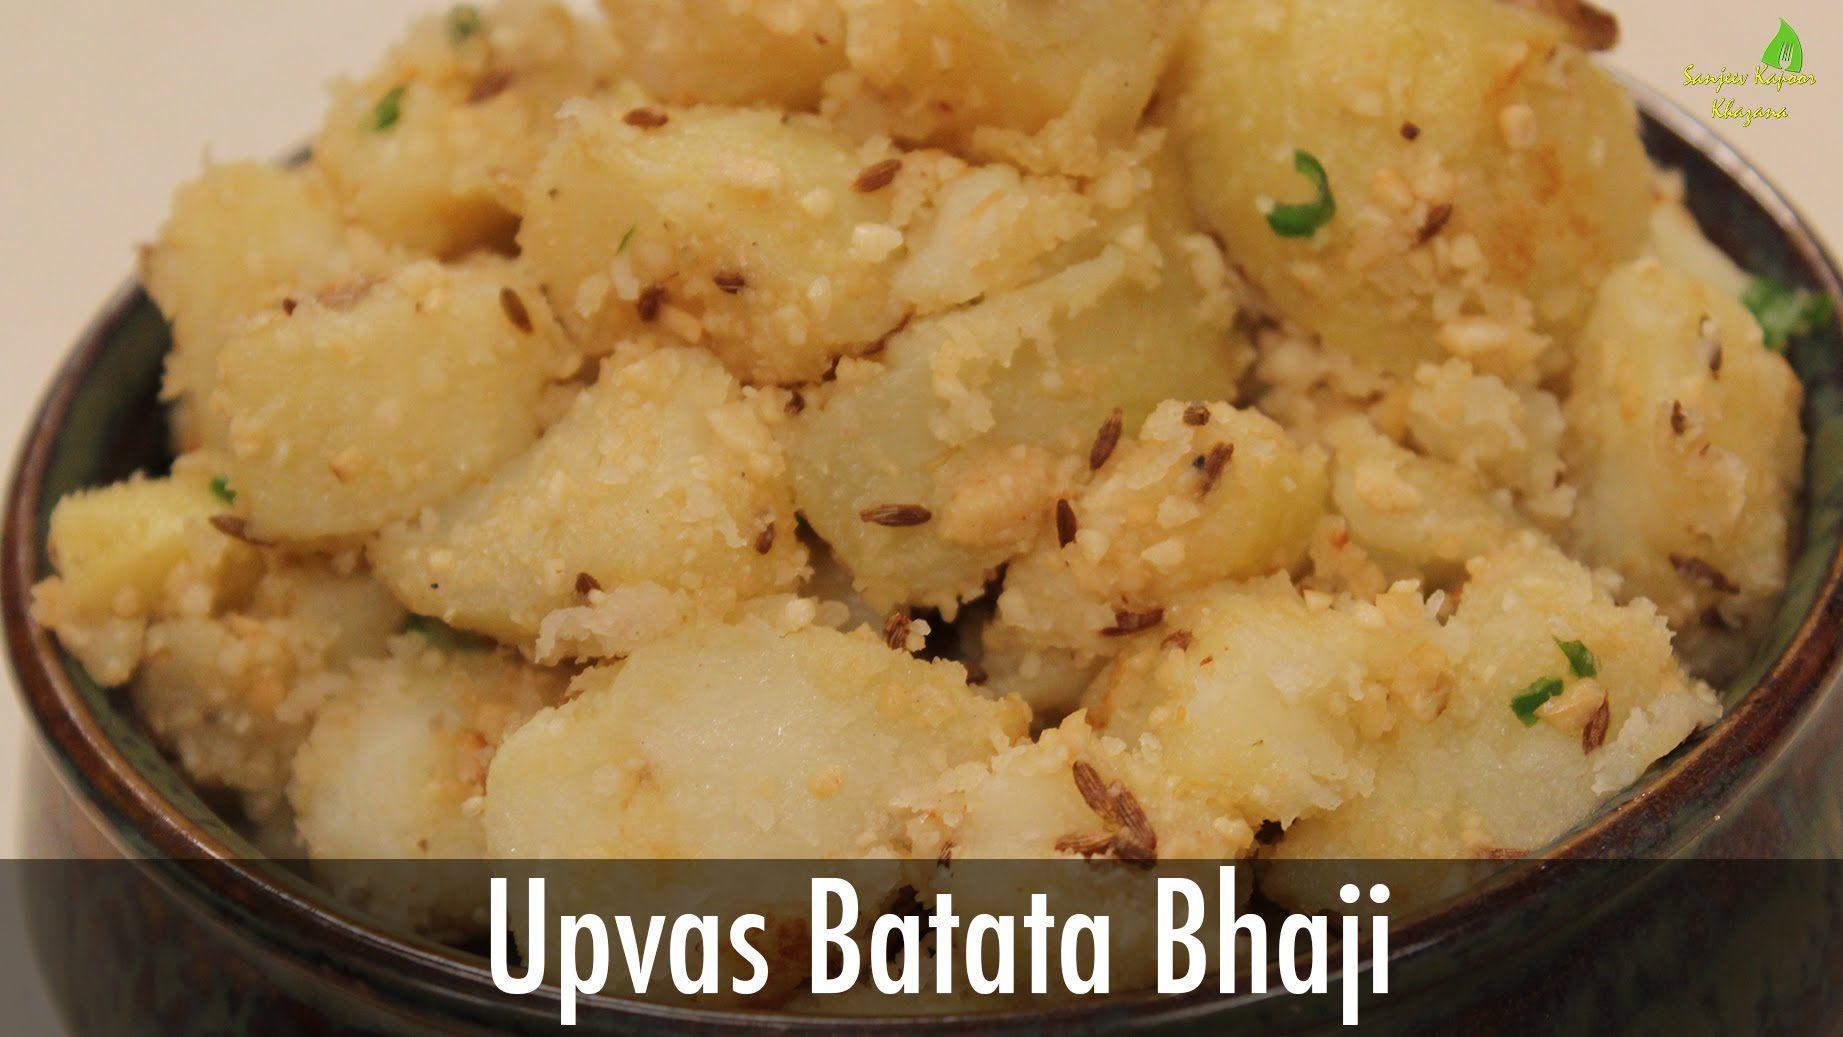 Upvas batata bhaji snacks recipe sanjeev kapoor khazana yumm upvas batata bhaji snacks recipe sanjeev kapoor khazana forumfinder Choice Image